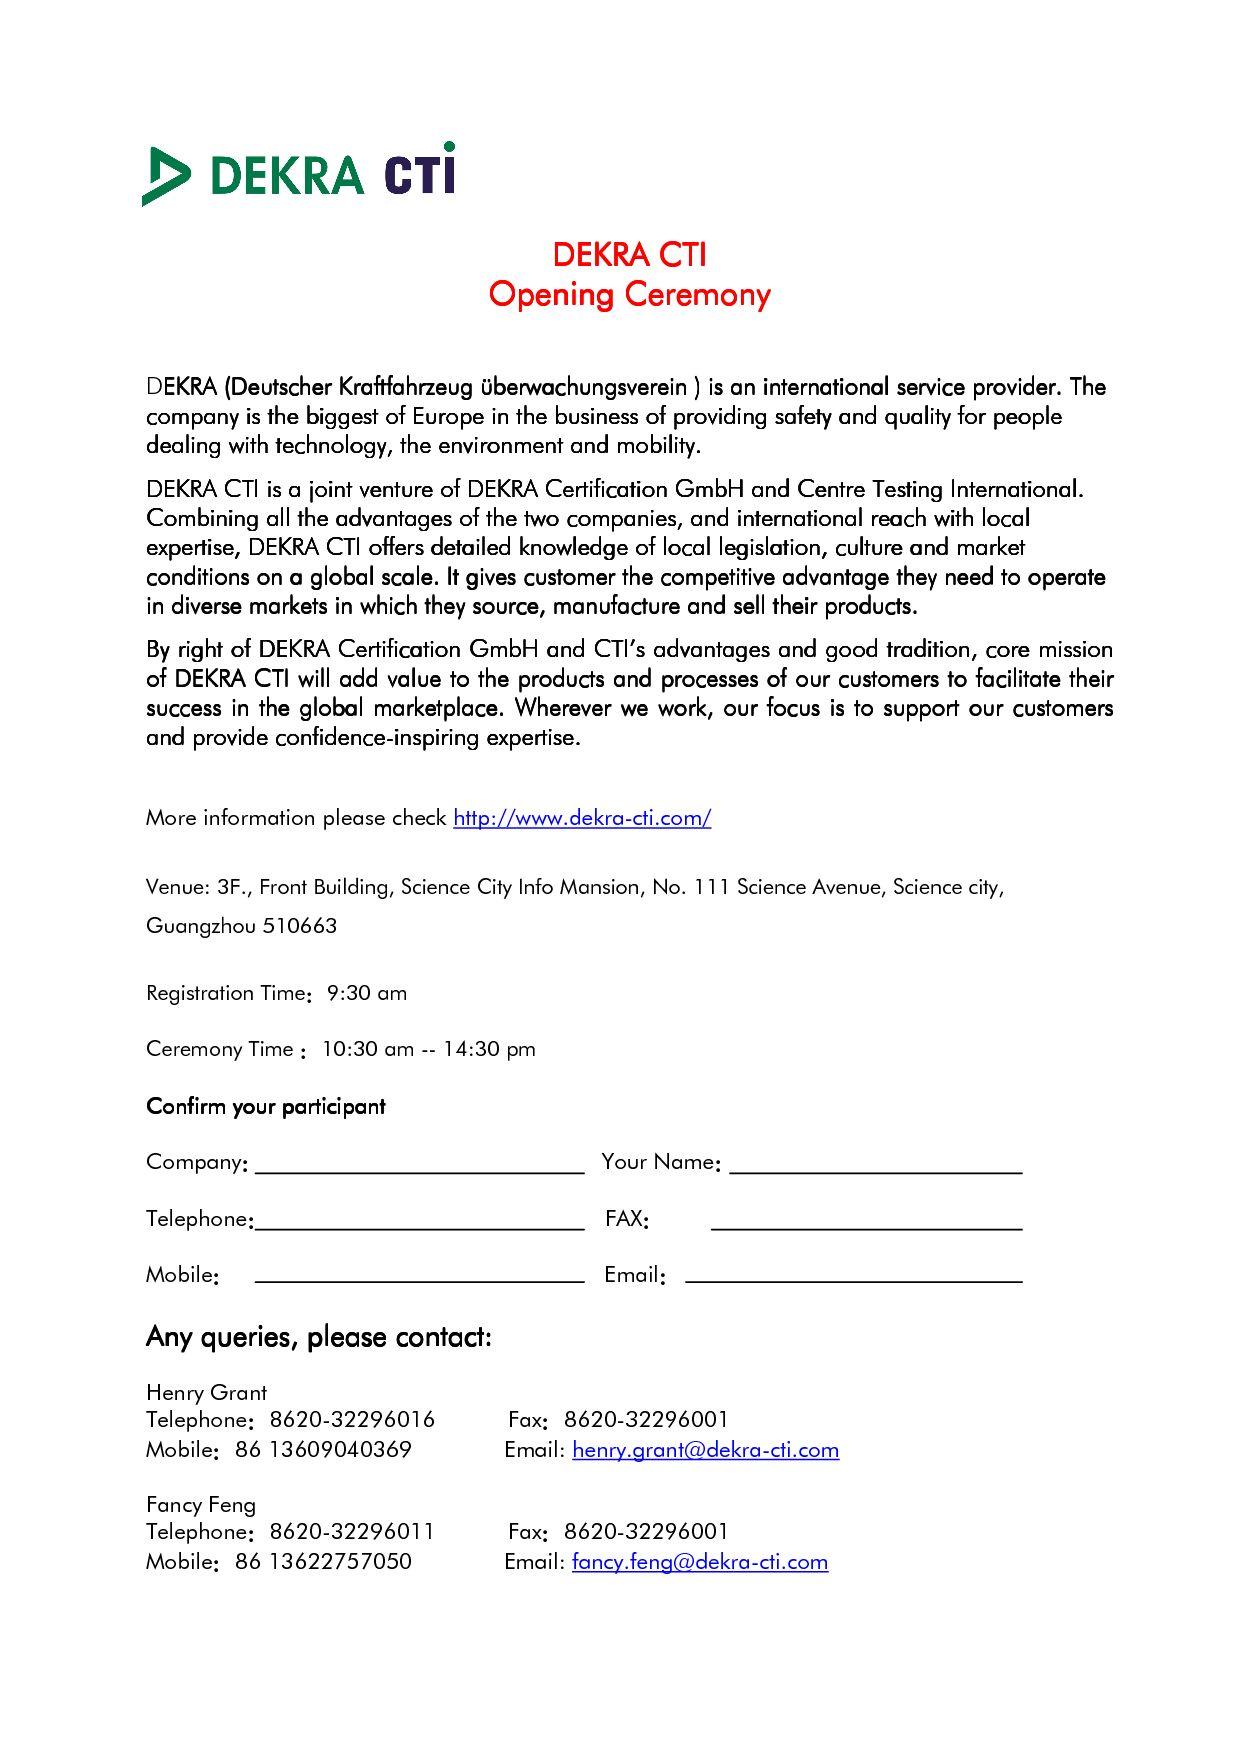 invitation letter format for opening